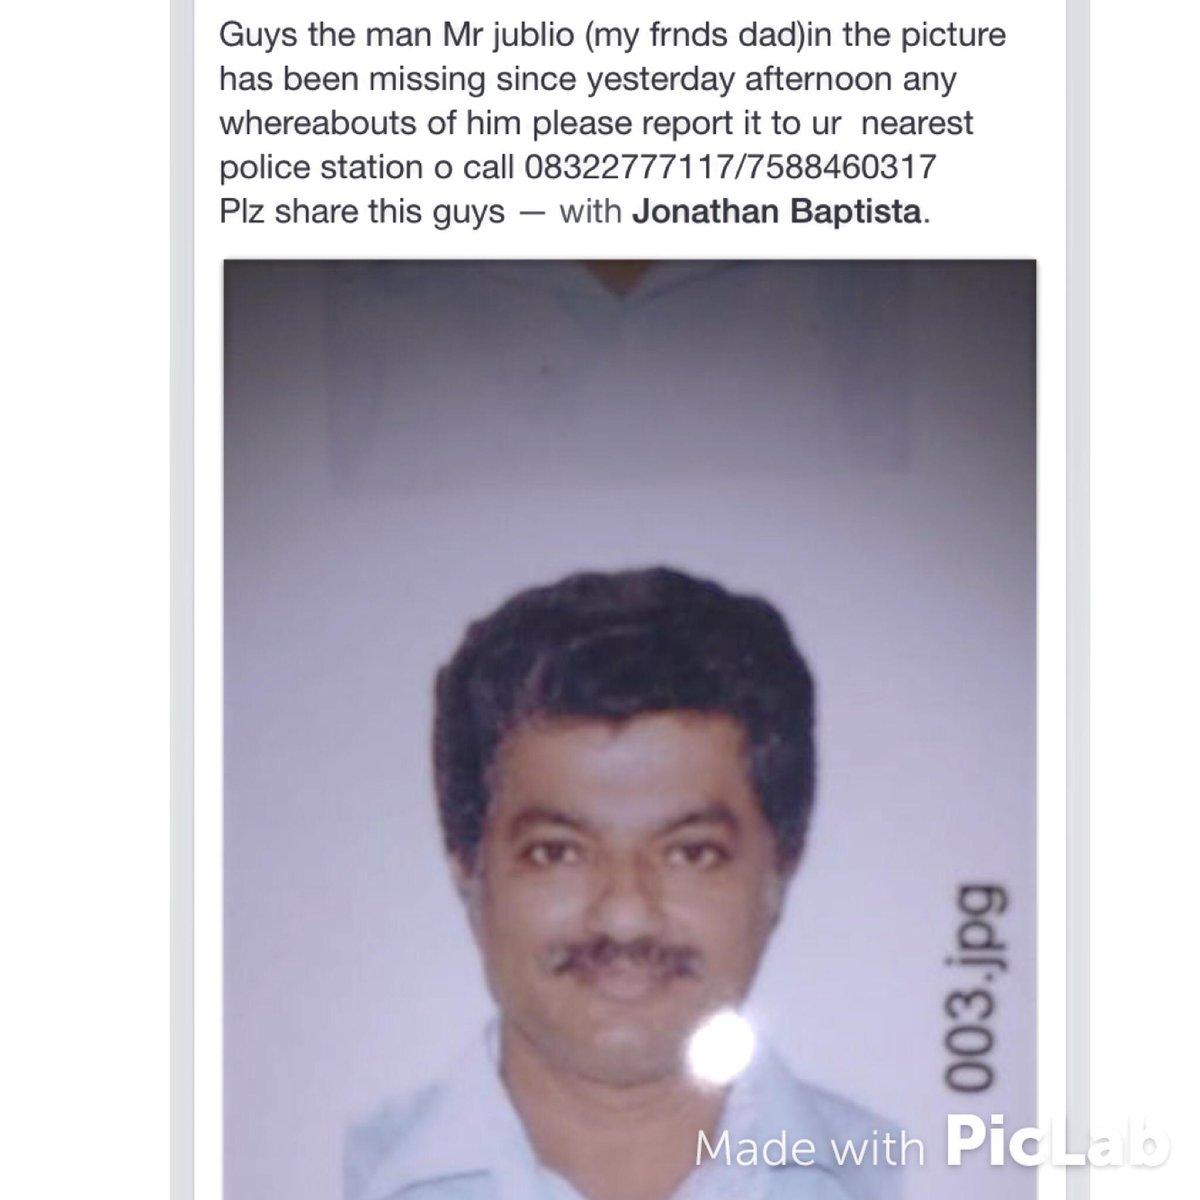 Guys, a friends father went missing on Wednesday near Ambora. Pls help with any information #plsRT @WeAreGoaaa #Goa http://t.co/k22MmDiPeu